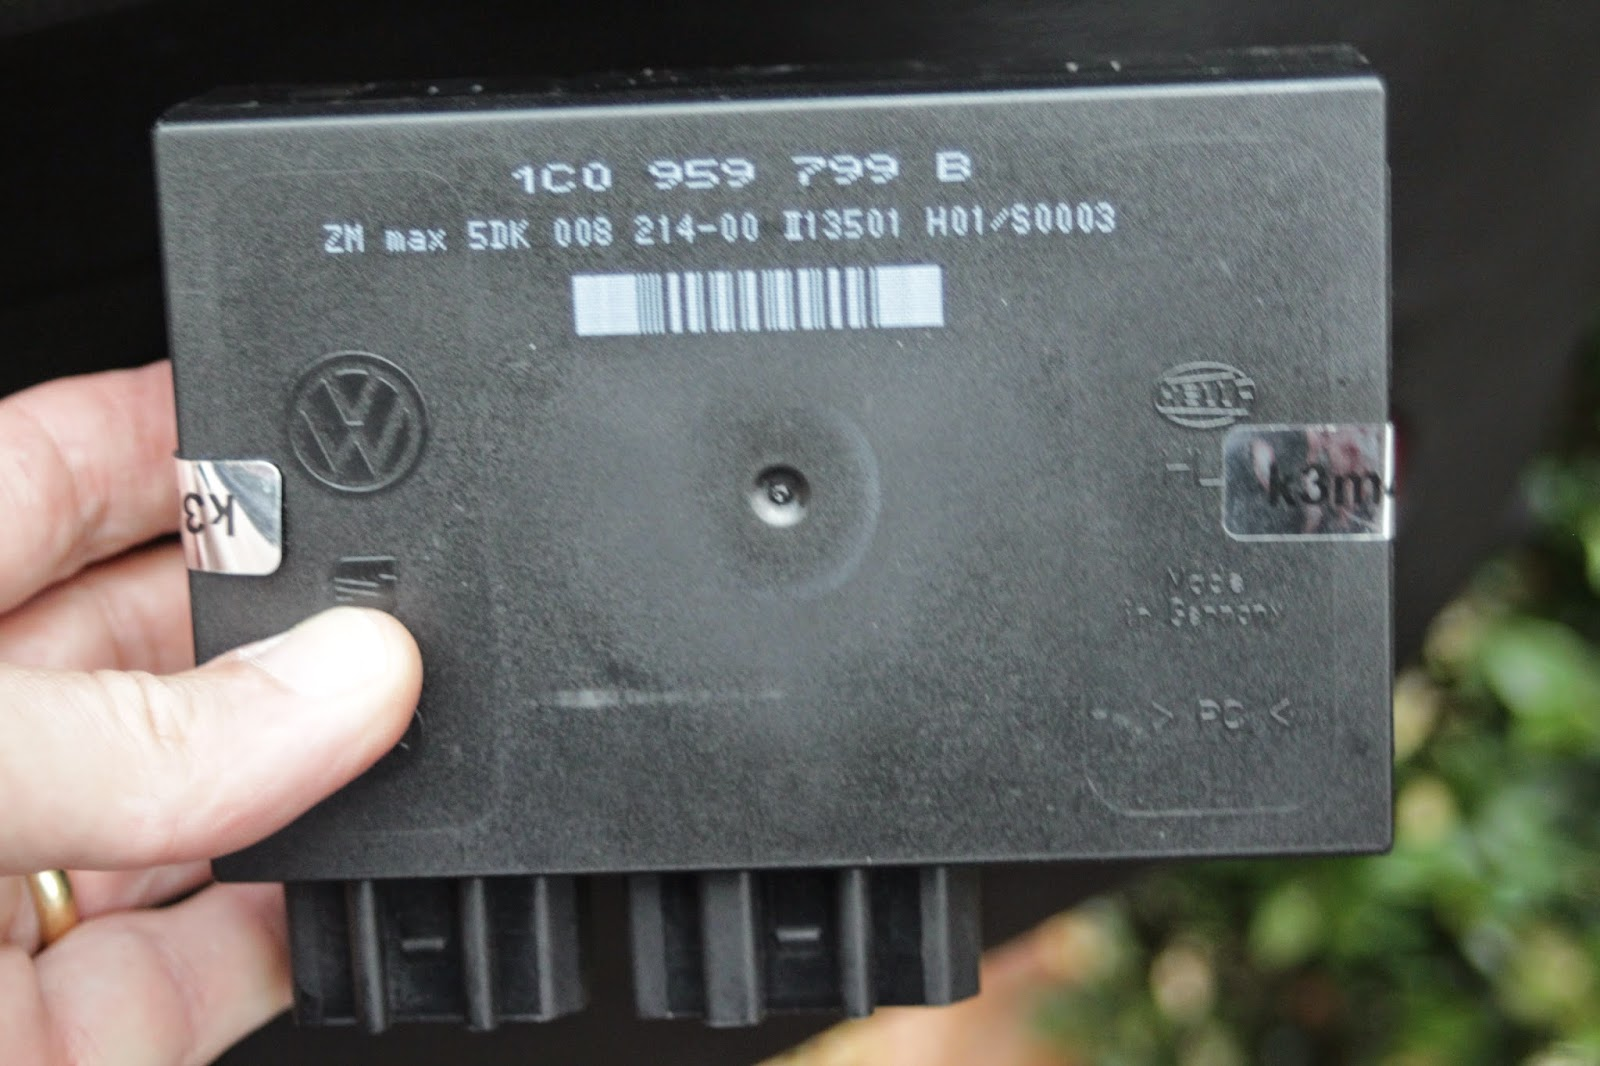 Photo of a CCM module from a VW Golf - Part 1C0 959 799B